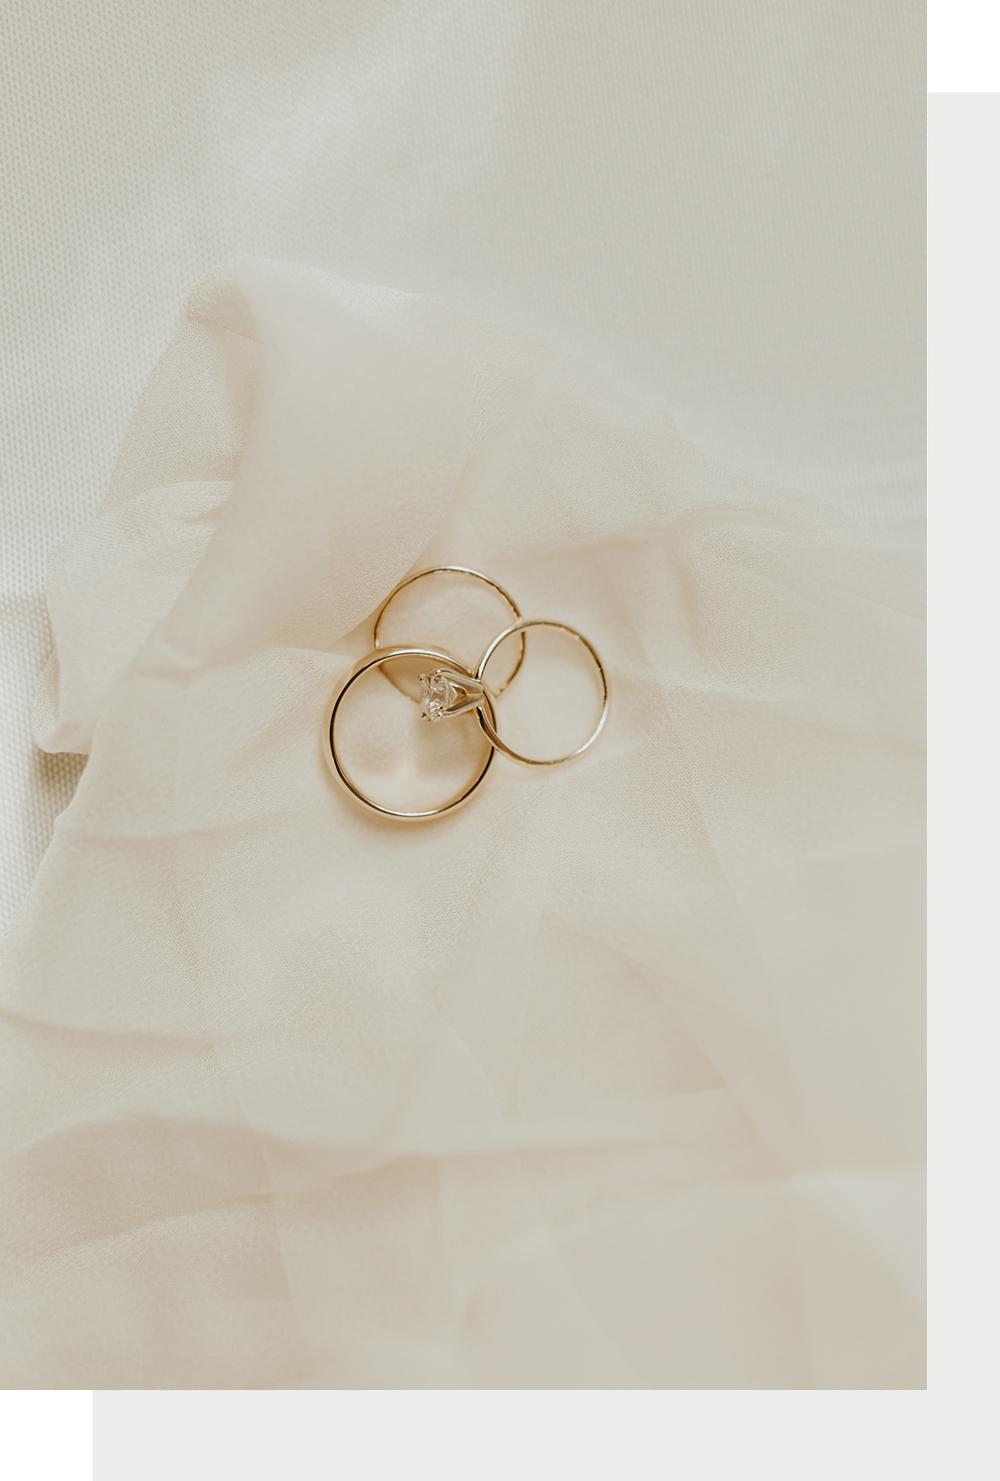 KO_Contact_Brides_Contact_Wedding_rings.jpg